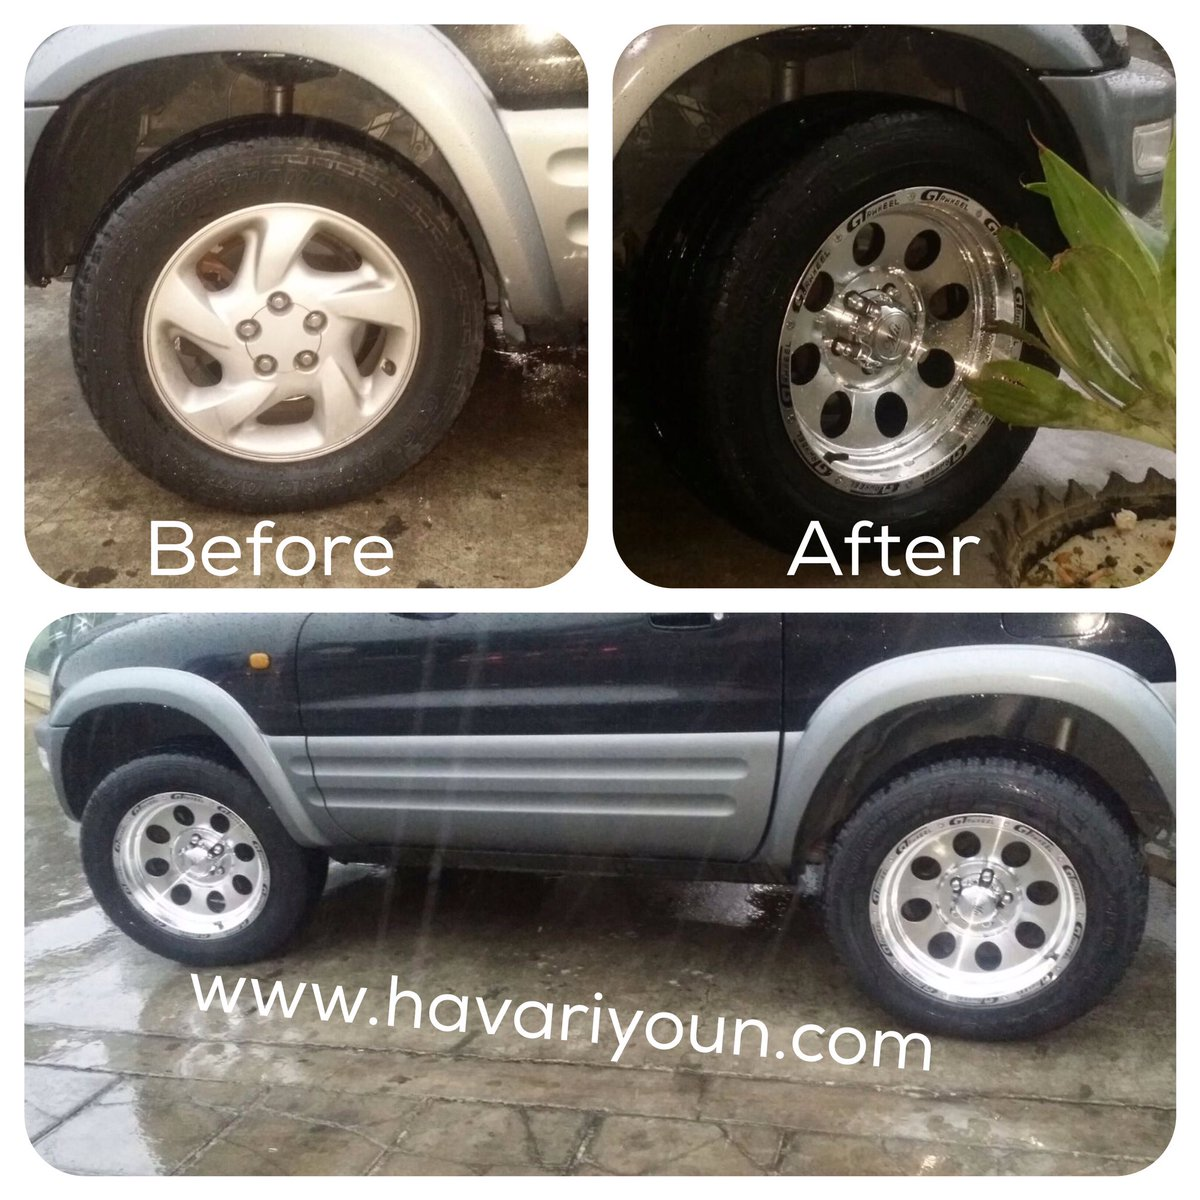 Havariyoun Tyres Wheels On Twitter New 4x4 Alloy Wheels Rims 16x7 5 5x114 3 On Toyota Rav4 Toyota4x4 Toyotarav4 Offroad Deepdish Auto Limassol Cyprus Nicosia Https T Co Uvldtdmitz